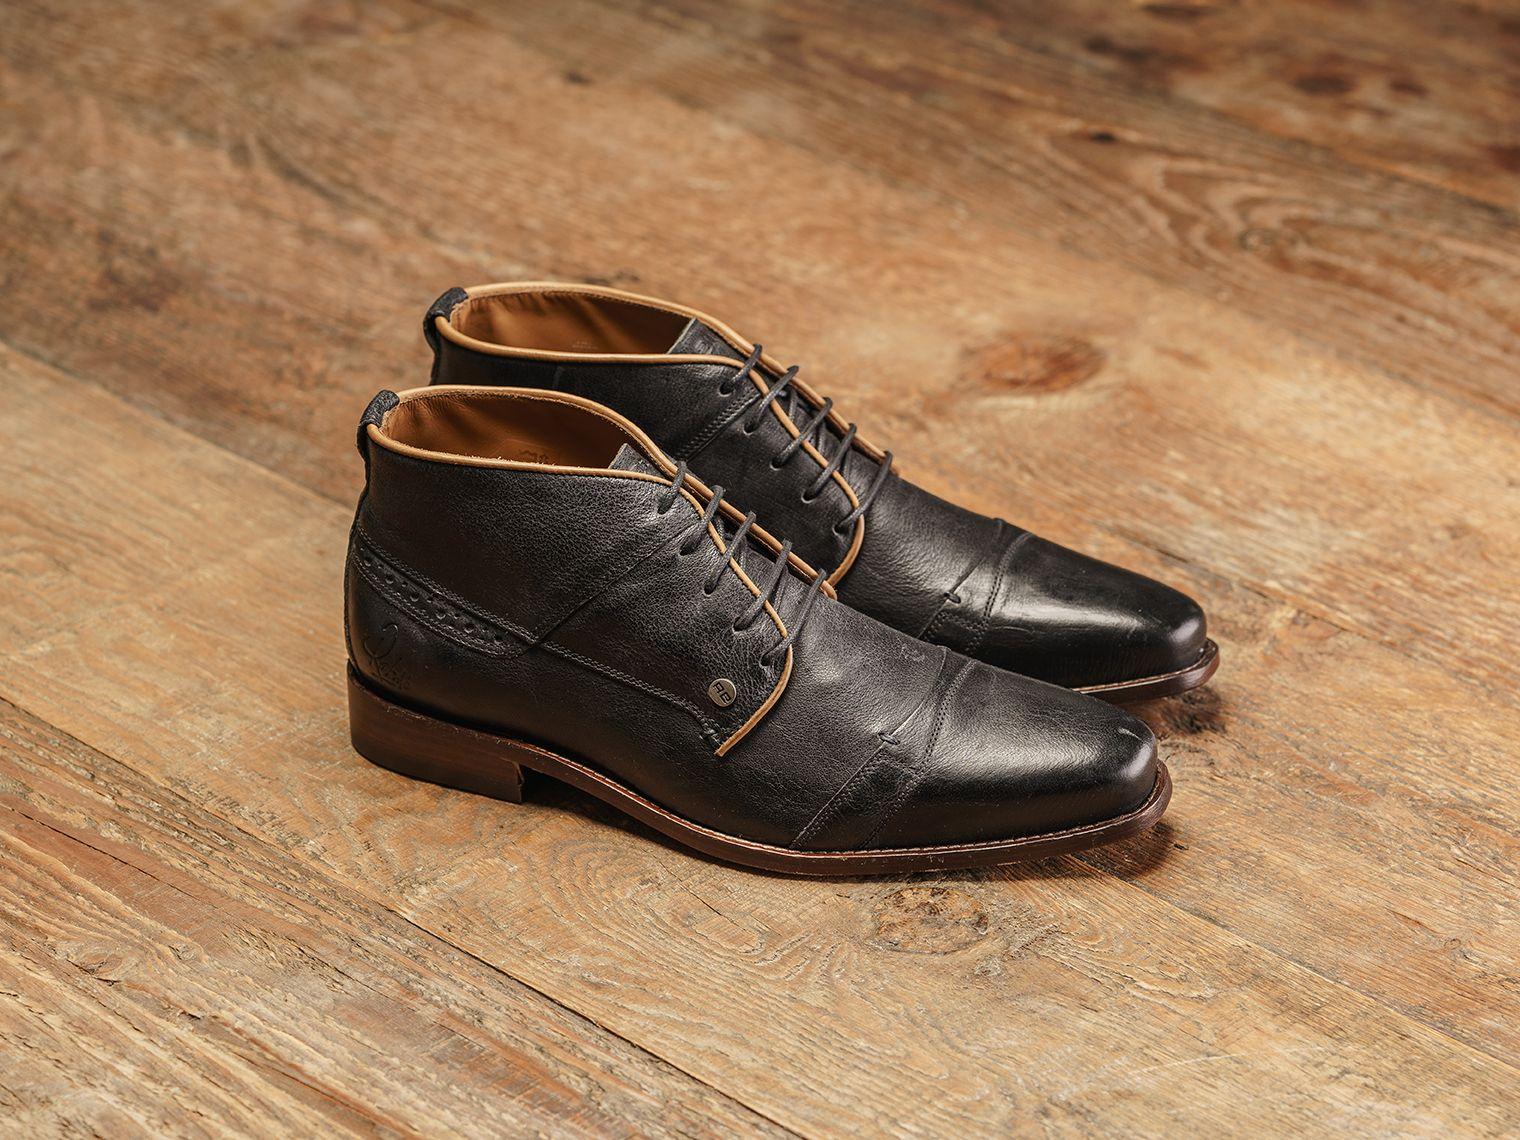 REHAB Lector Nero #rehabfootwear #lector #nero #menshoes #qualityshoes #buffalo #leather #lionprint #classy #stylish #neveroutofstyle